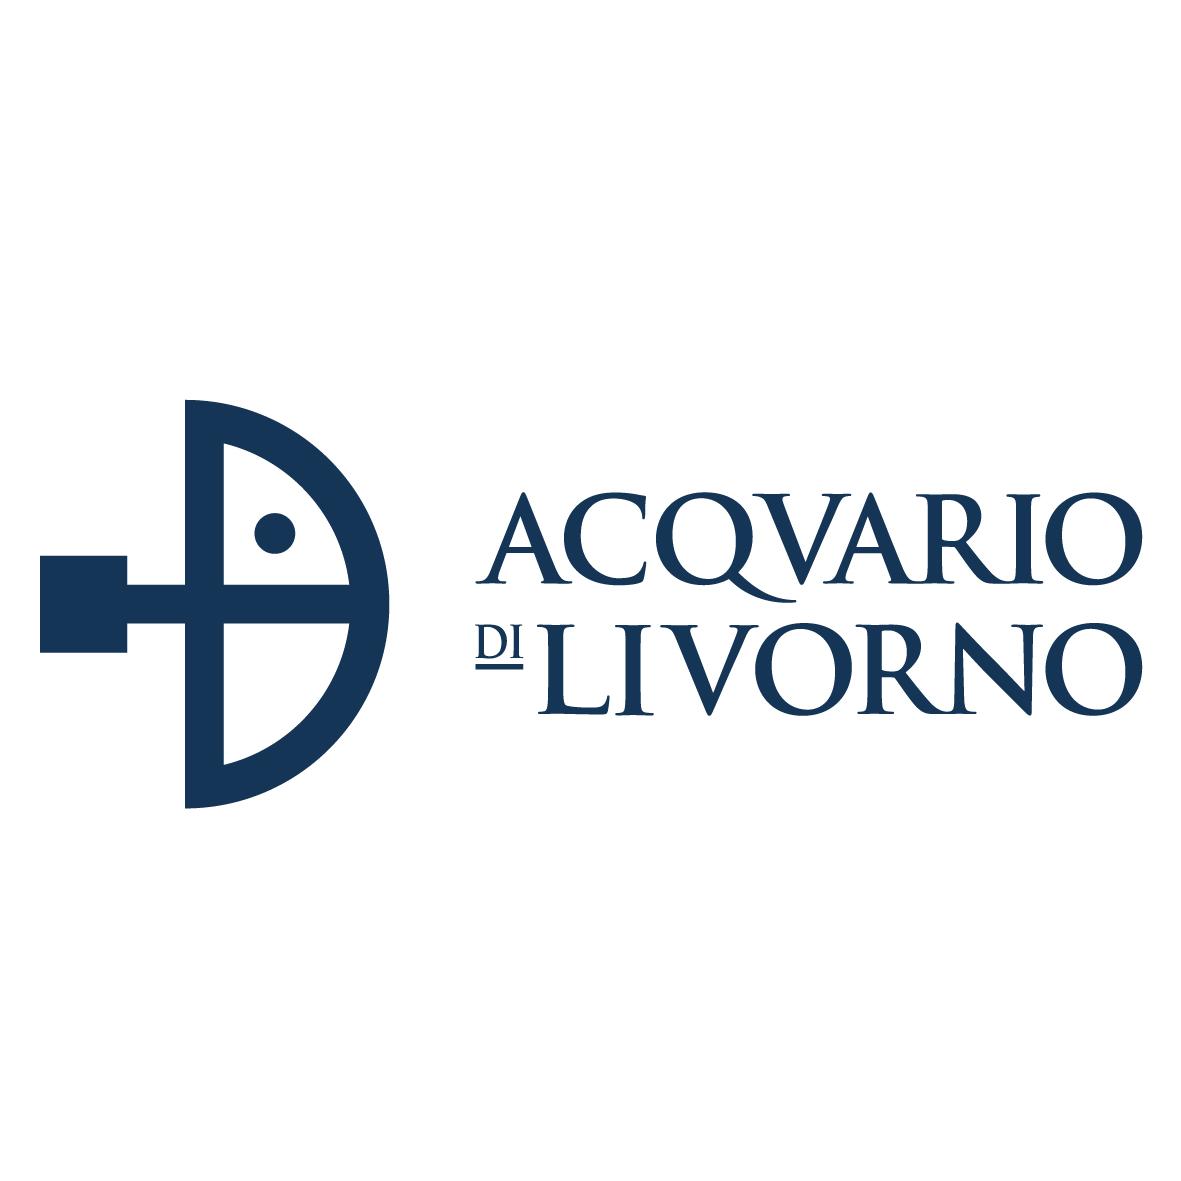 Acquario_logo_2013_blu